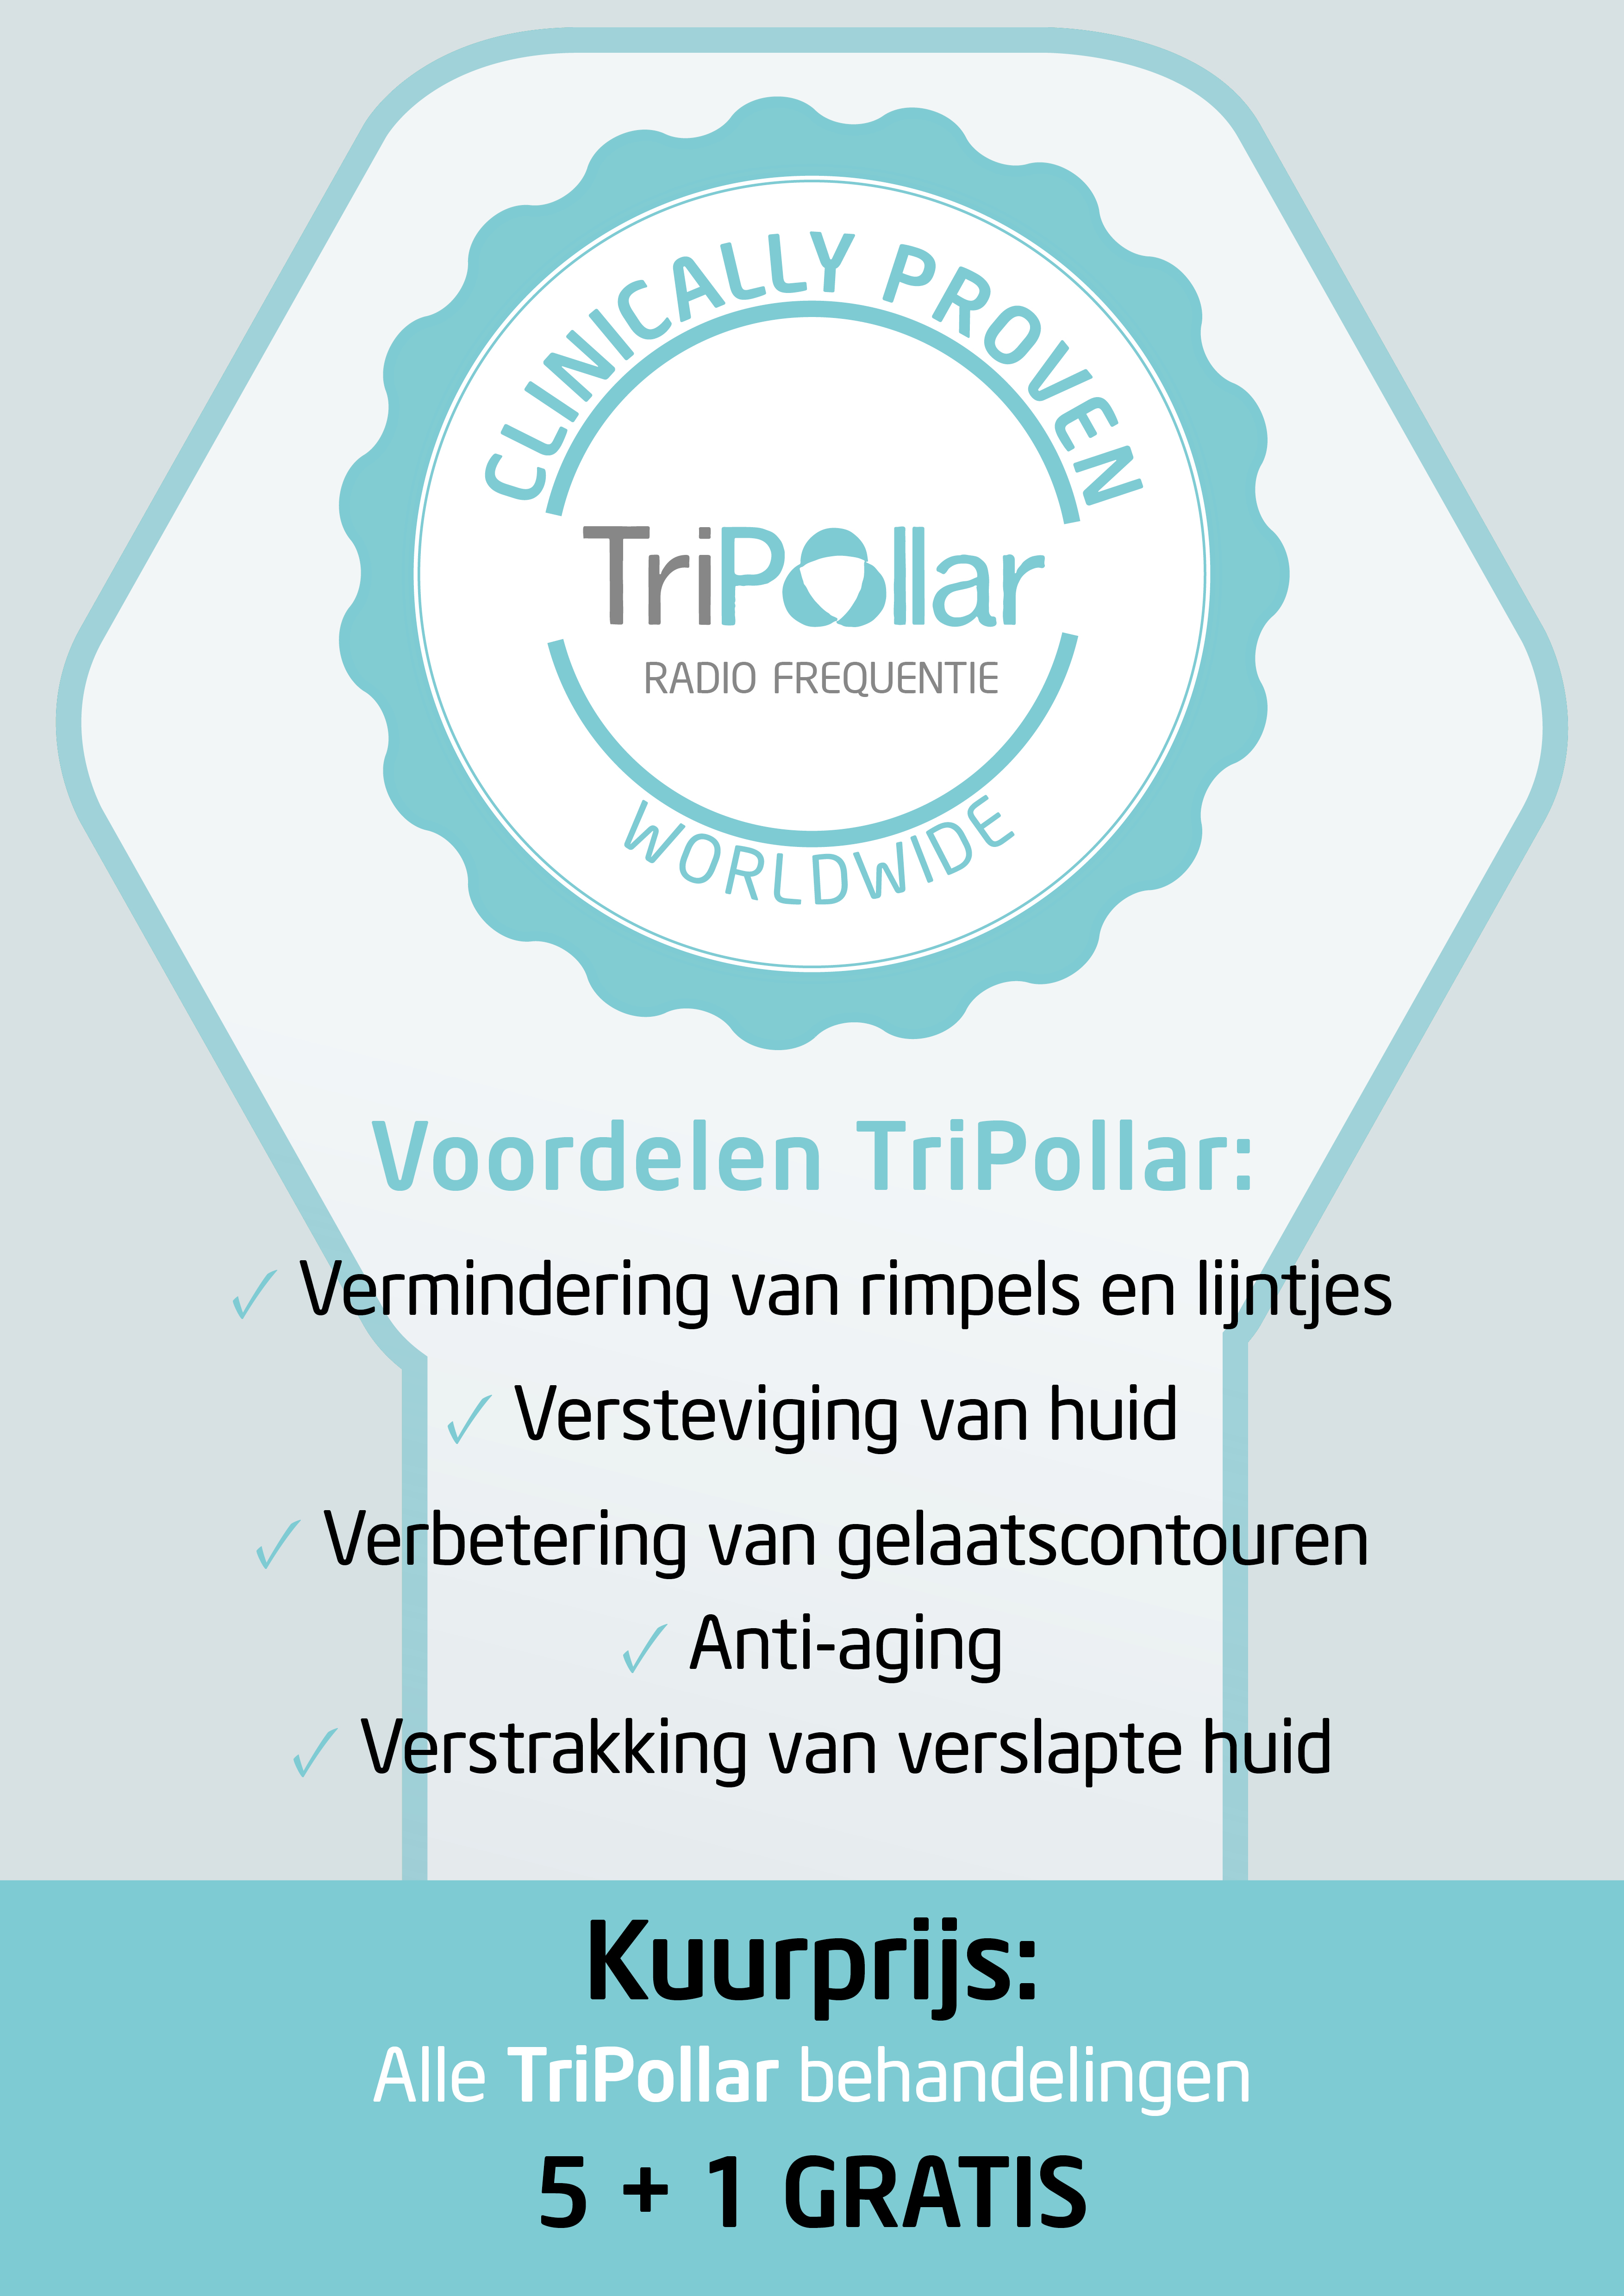 vb01 A1 poster tripollar